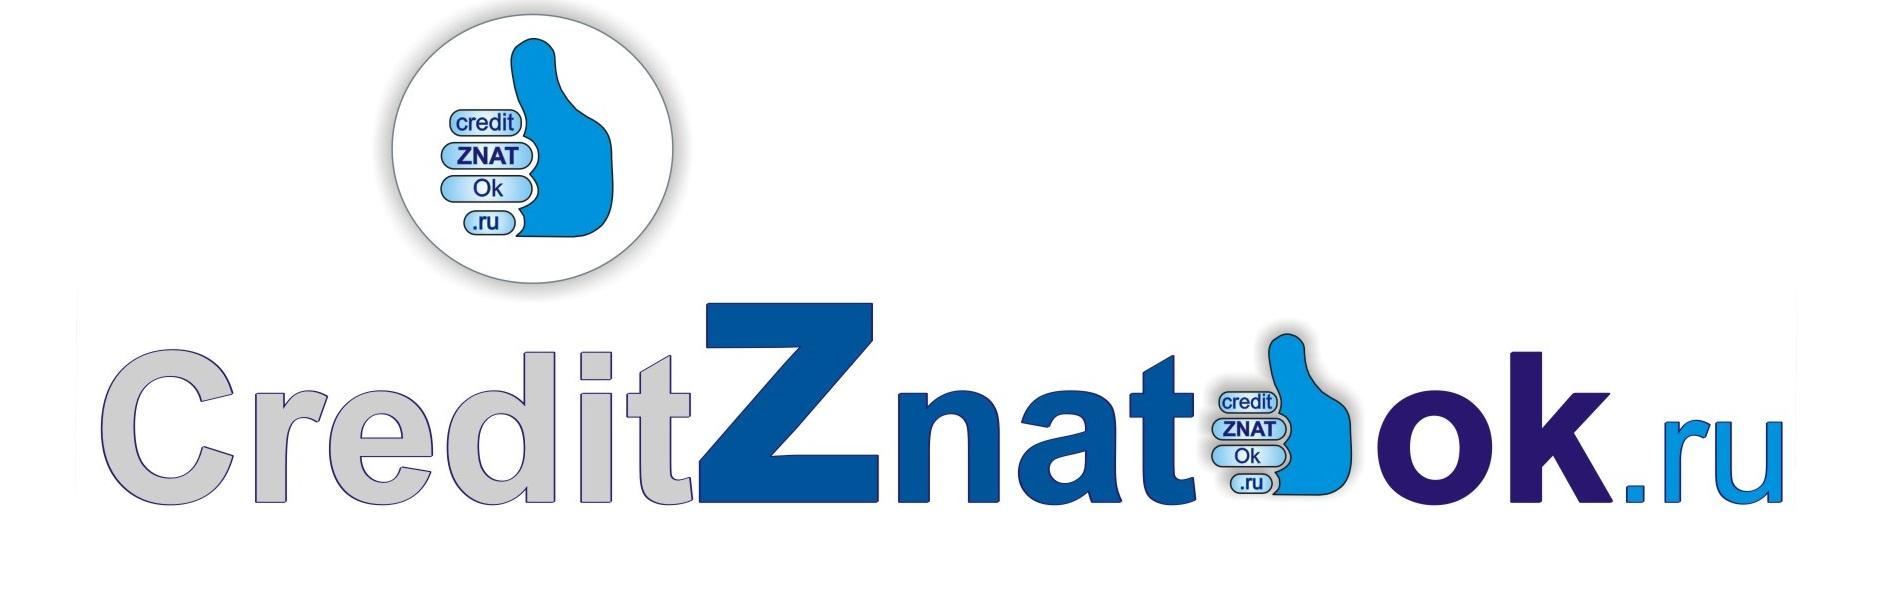 creditznatok.ru - логотип фото f_6895891fbf21018b.jpg